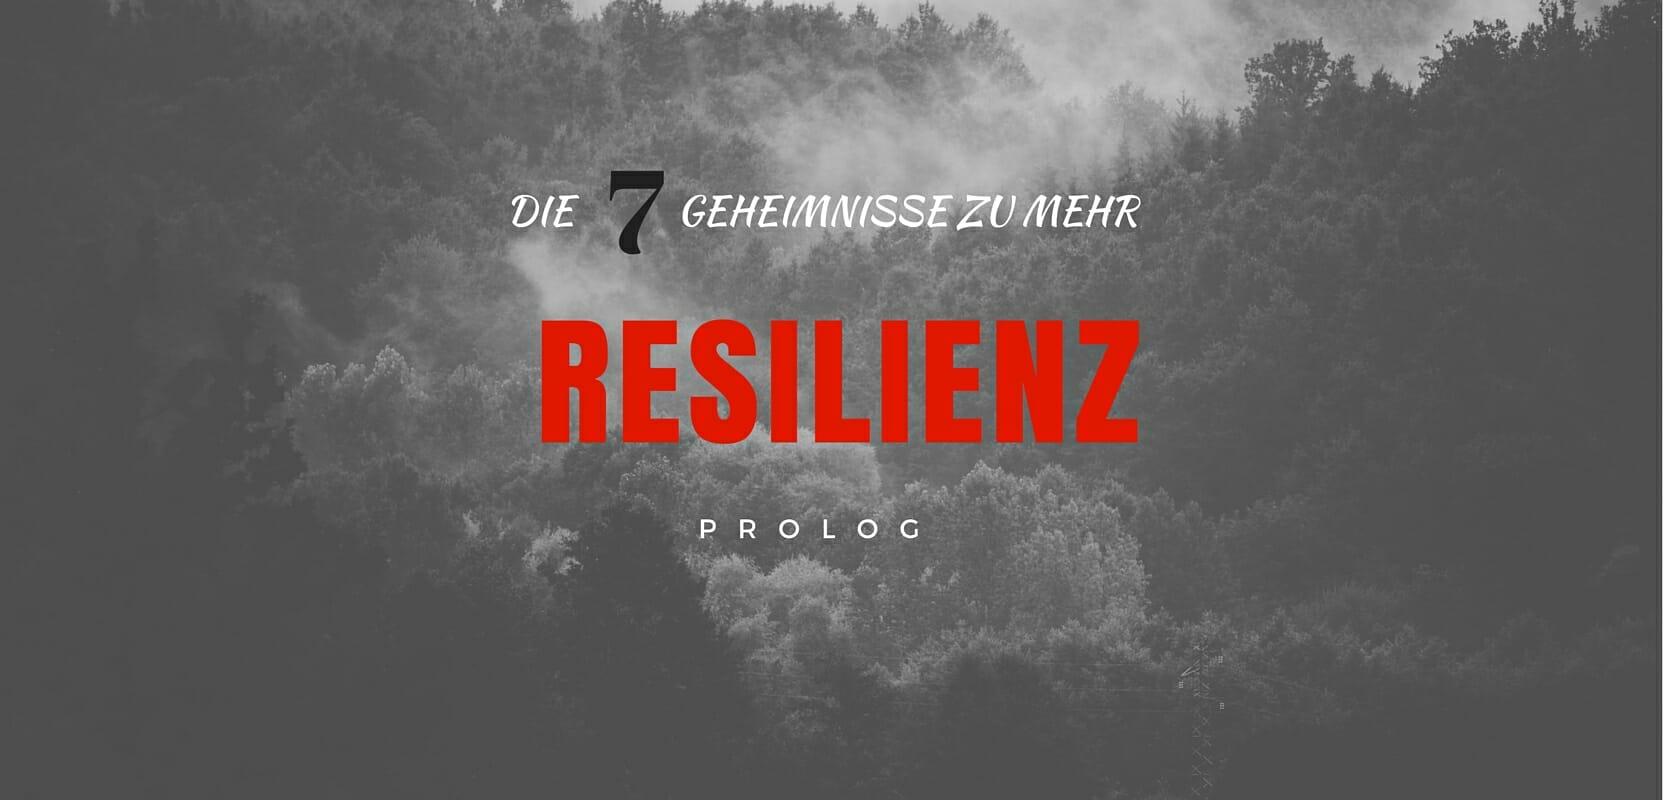 resilienz fördern, selbstvertrauen